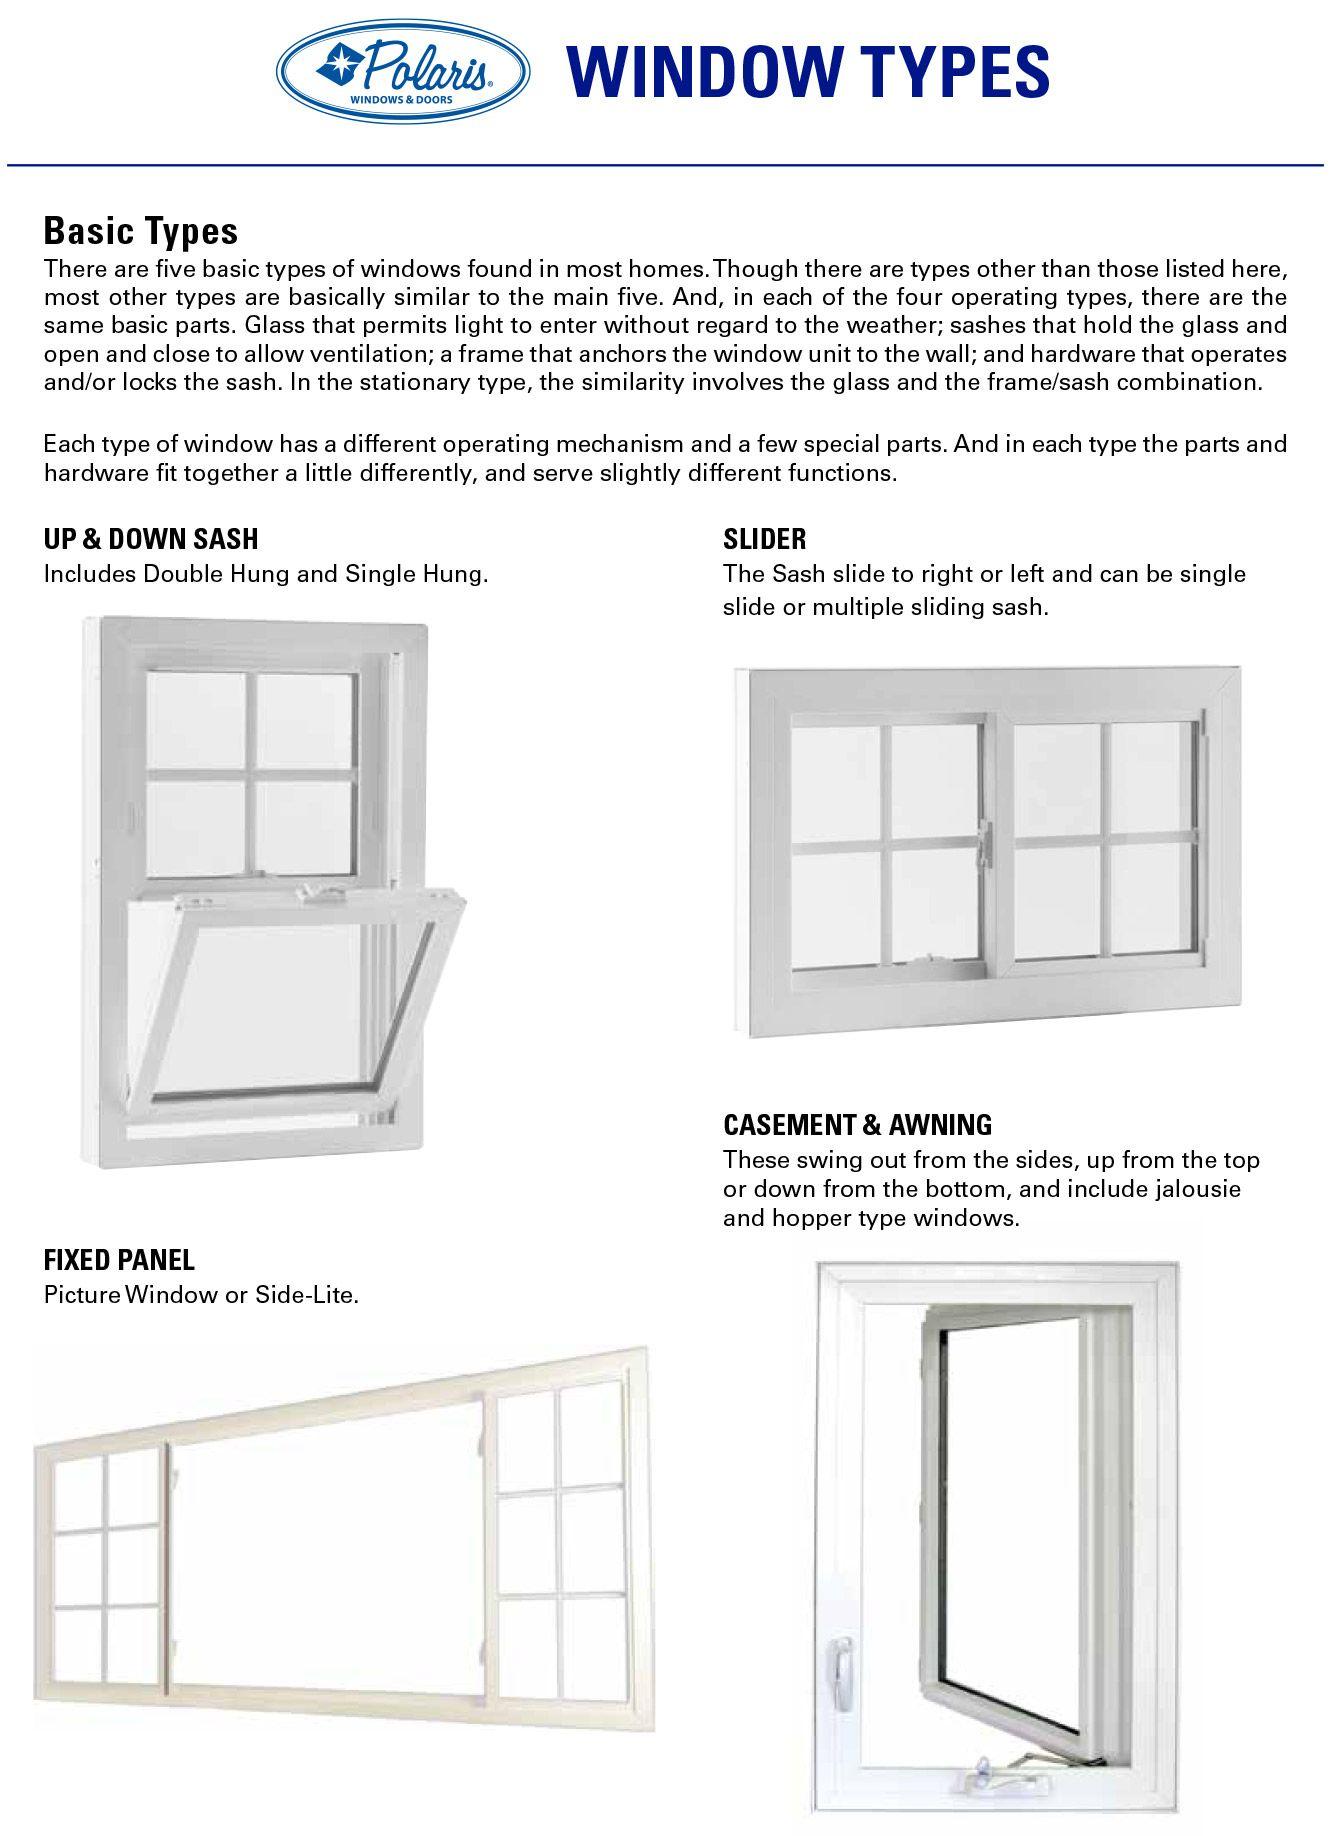 Furniture Furniture Window Styles Window Styles Window Styles Window Styles Windows Window Types